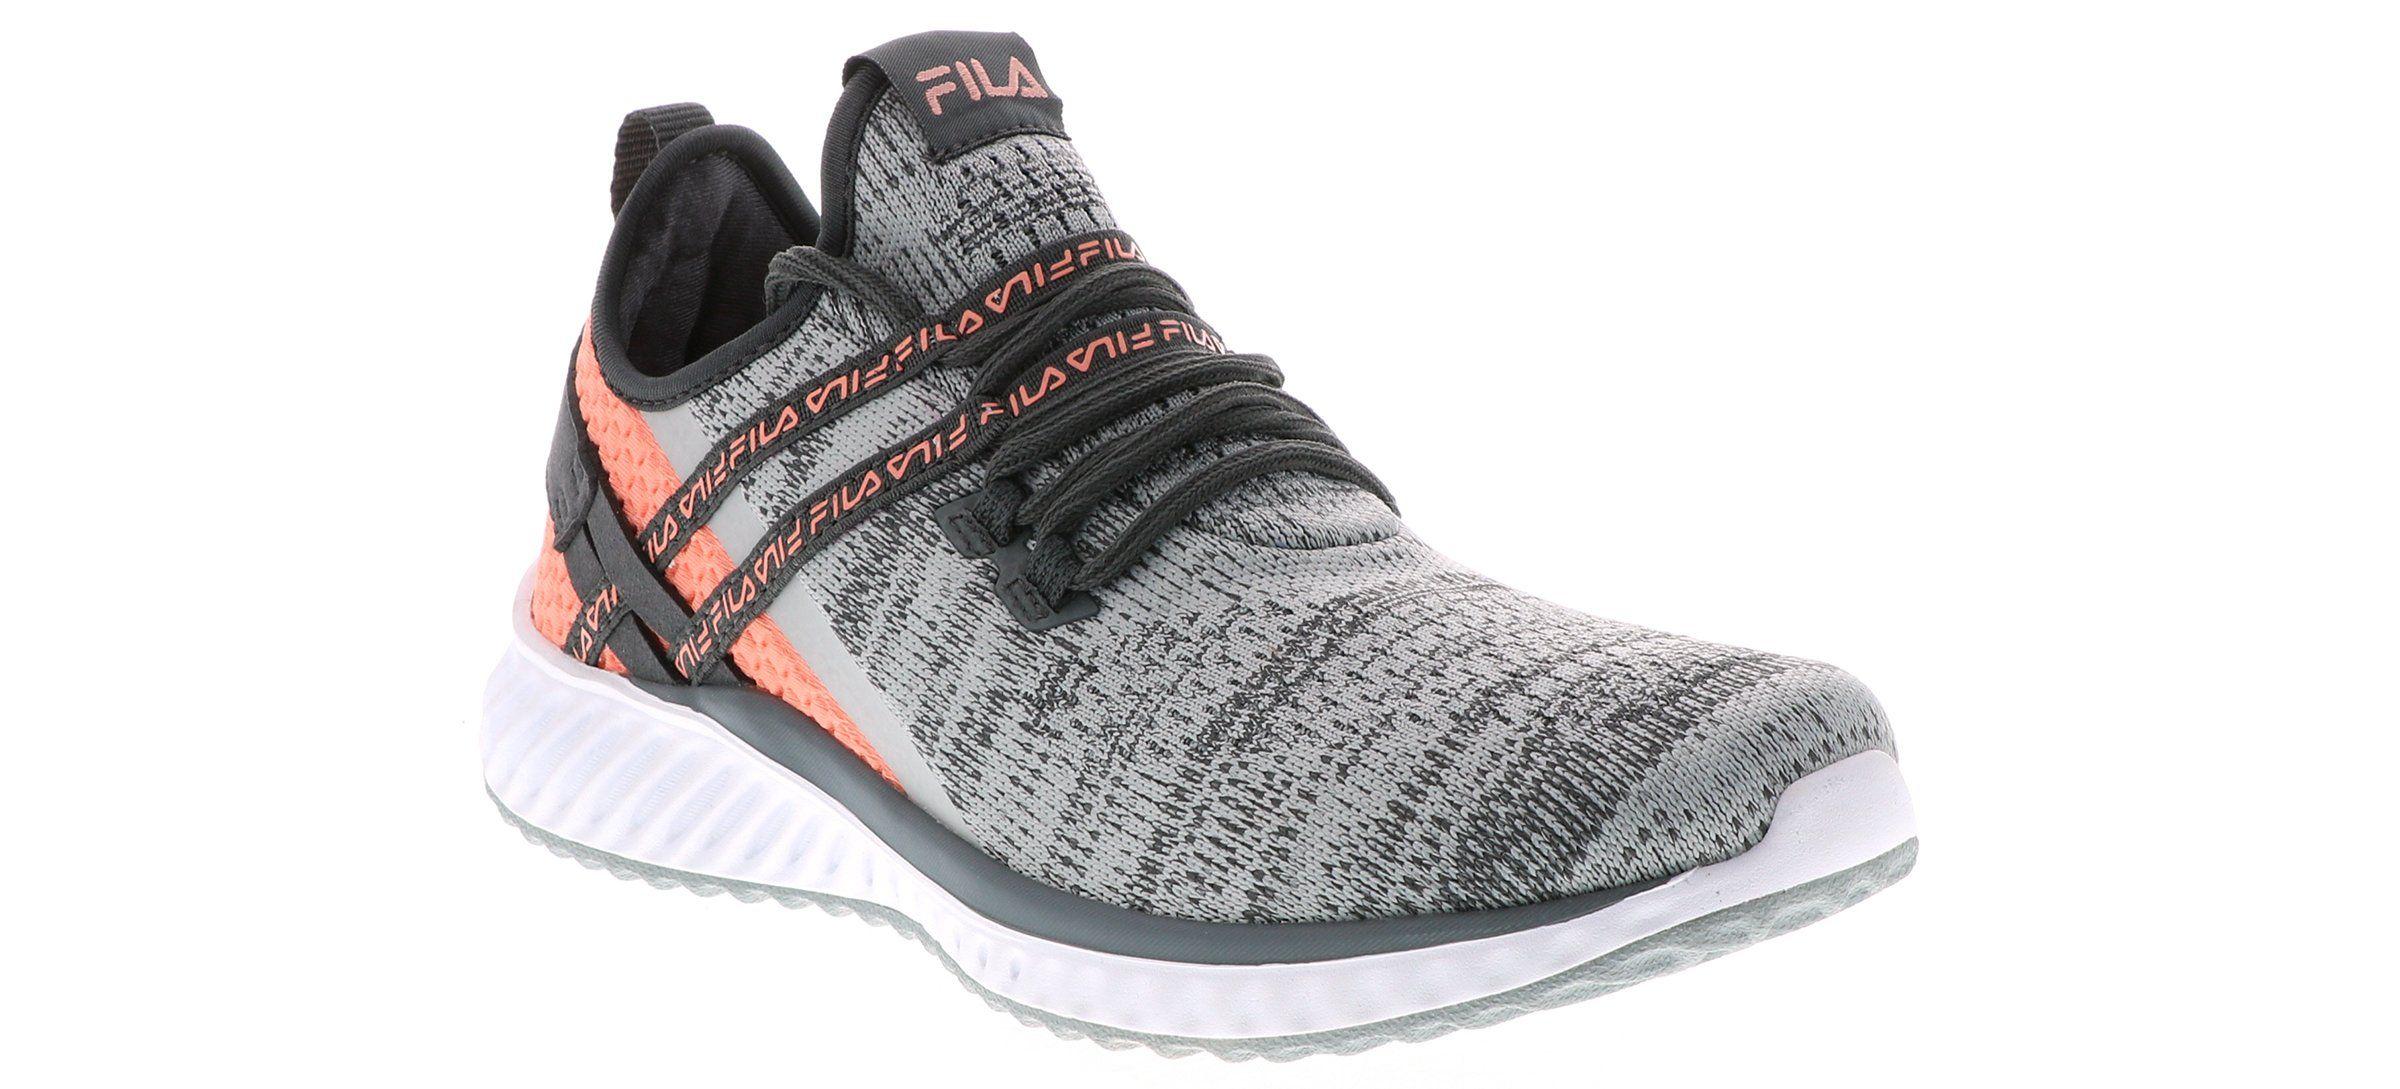 fila memory realmspeed women's running shoes